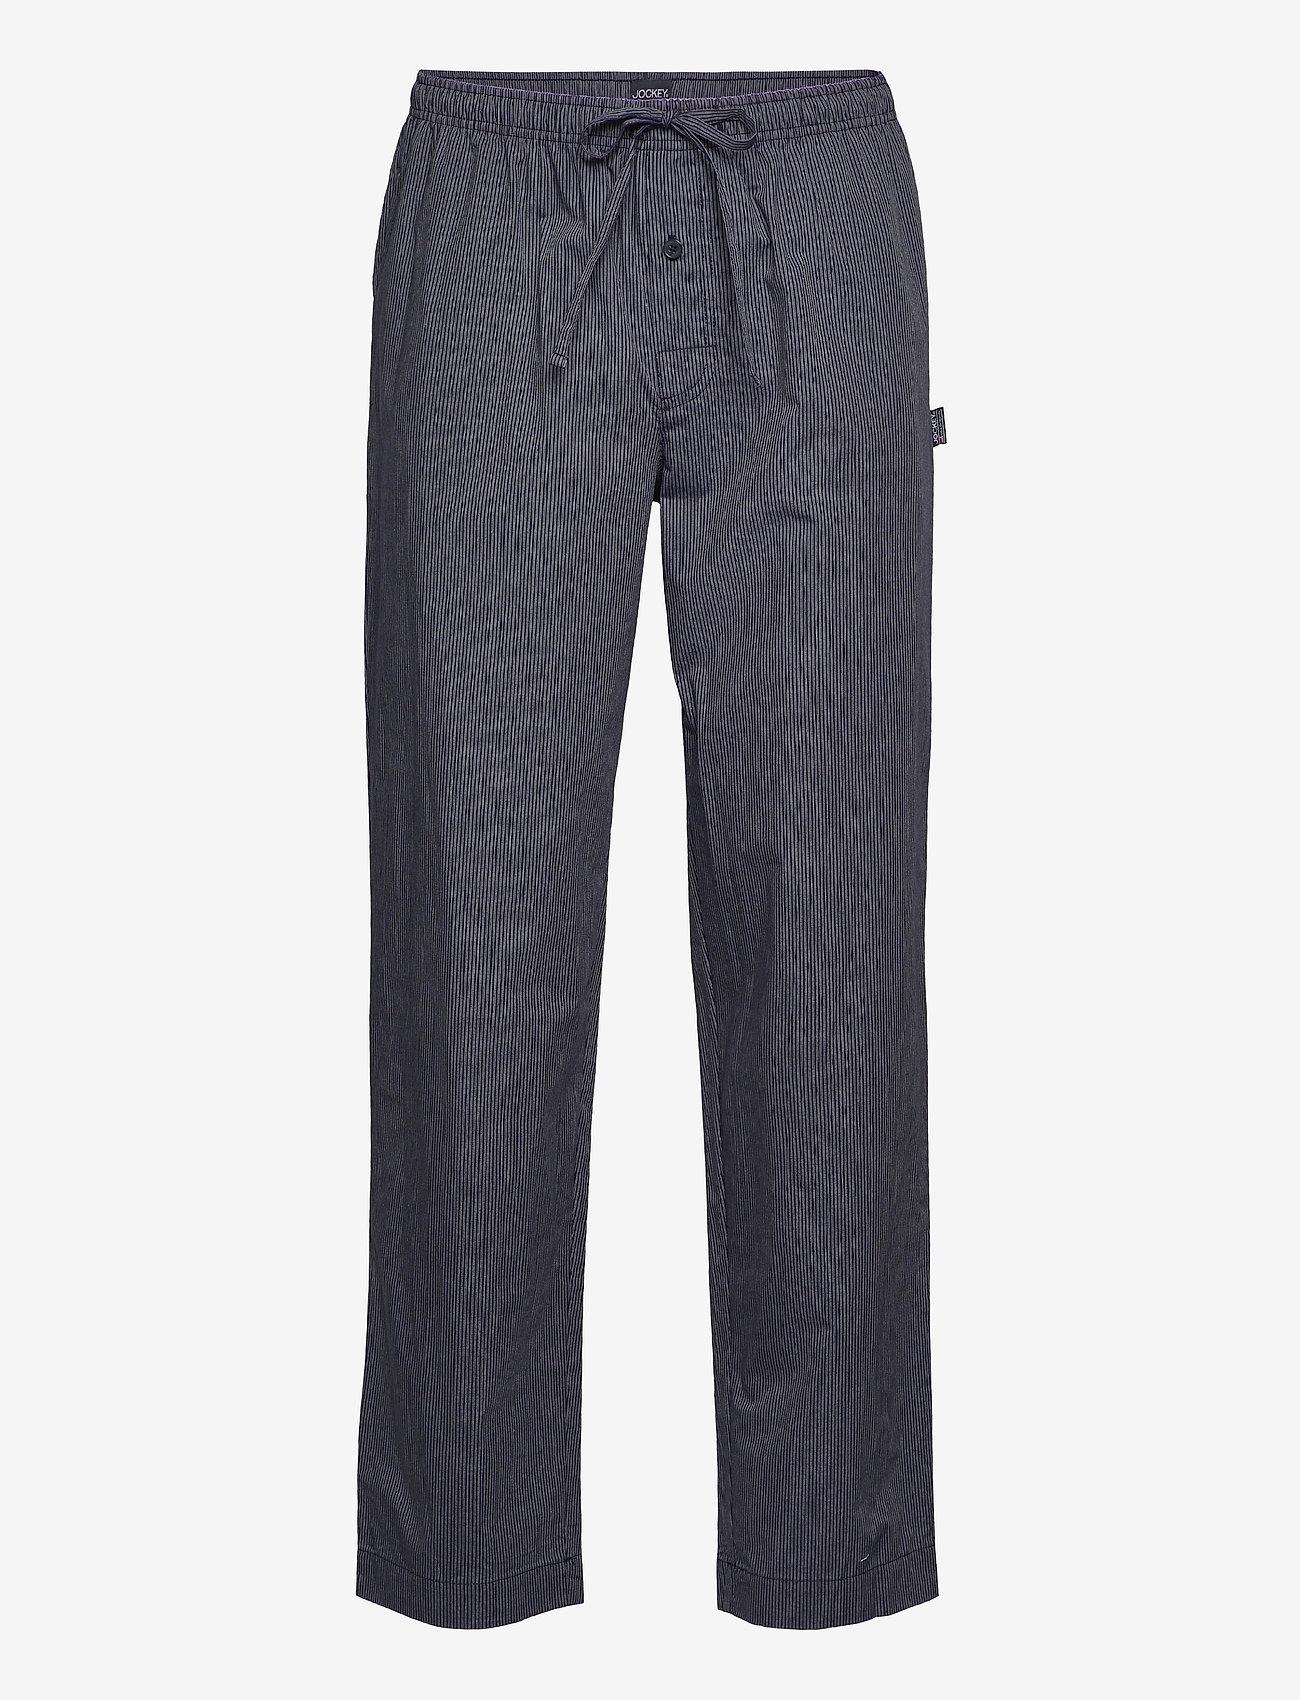 Jockey - Pant woven - bottoms - navy - 1